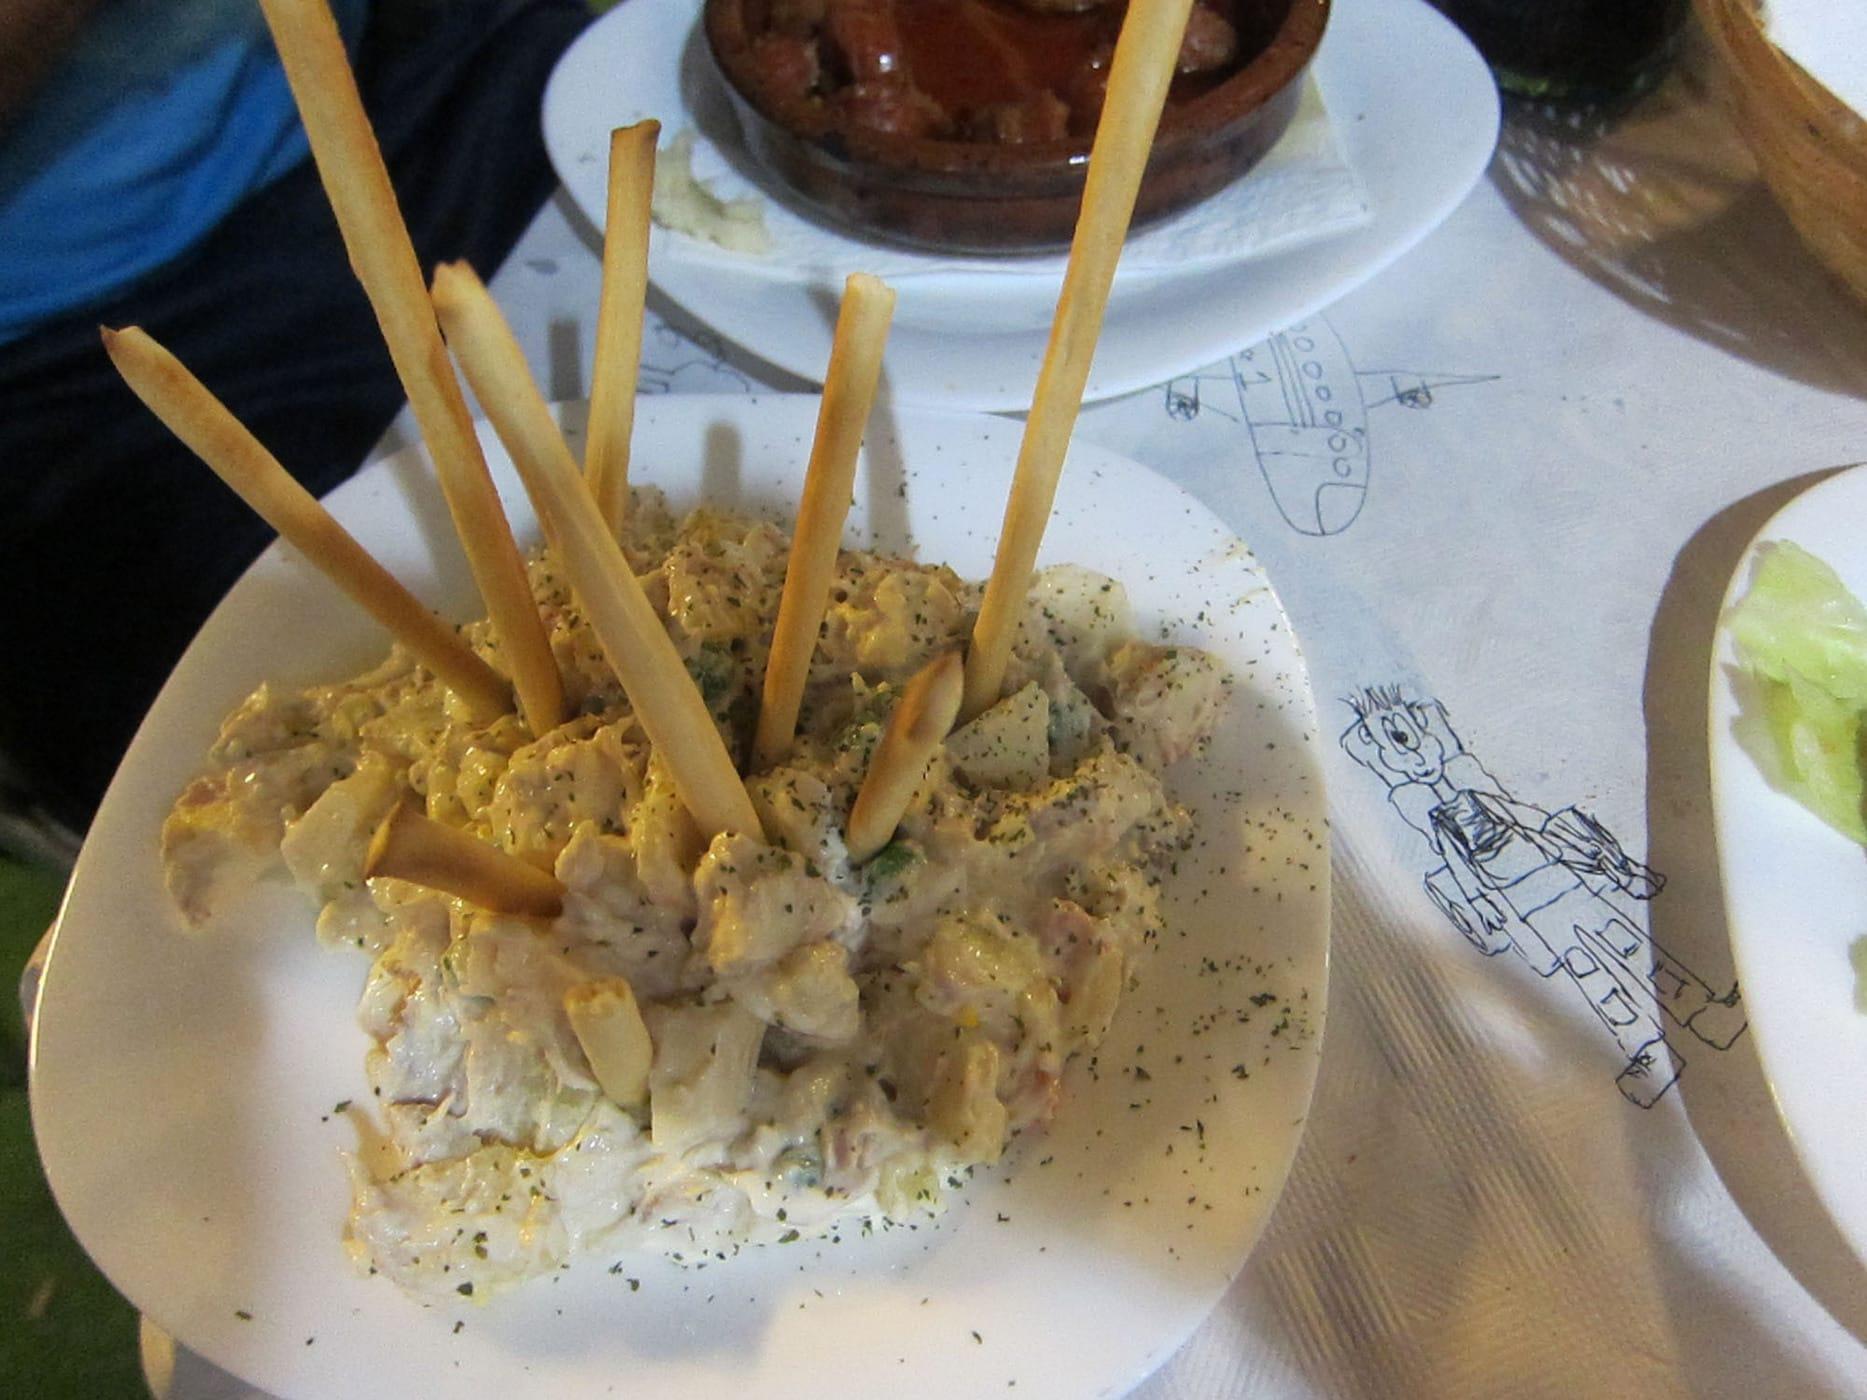 Russian salad tapas in Valencia, Spain.